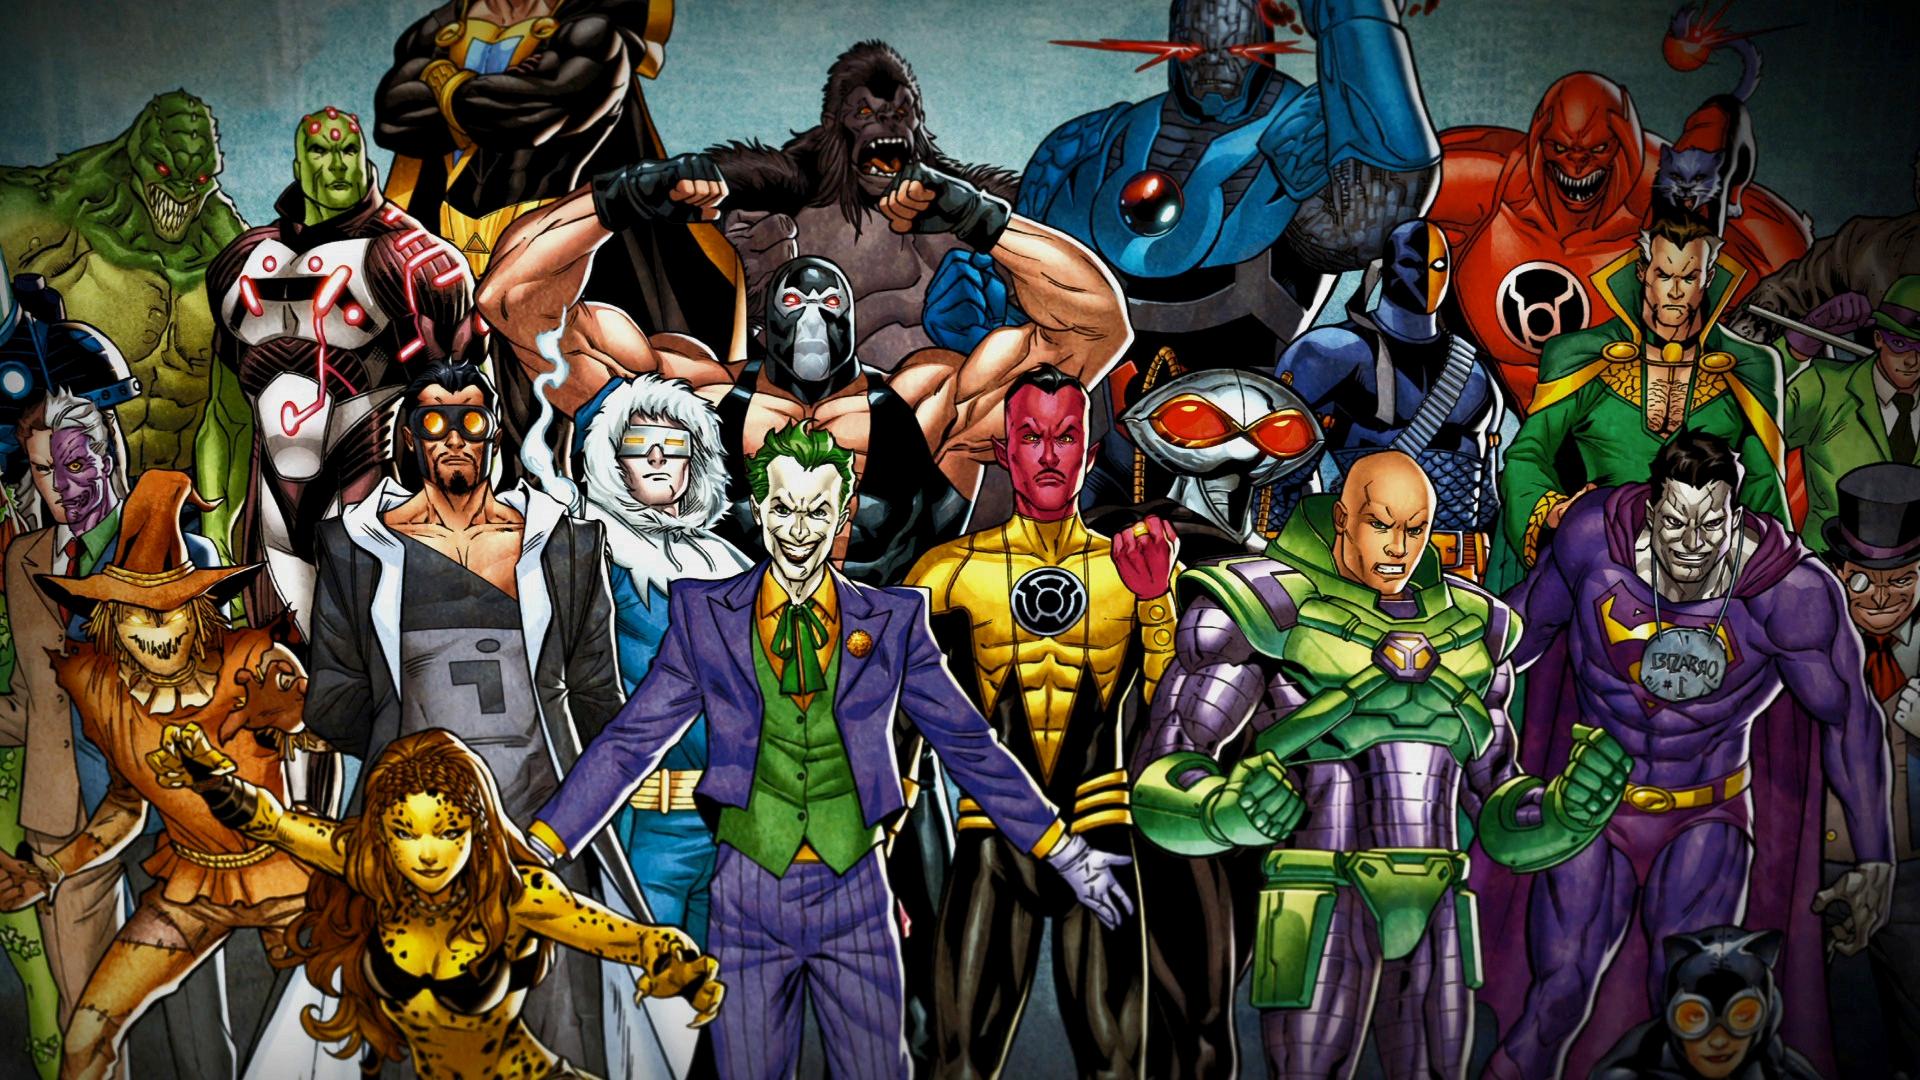 Image Credit: super-villain.wikia.com